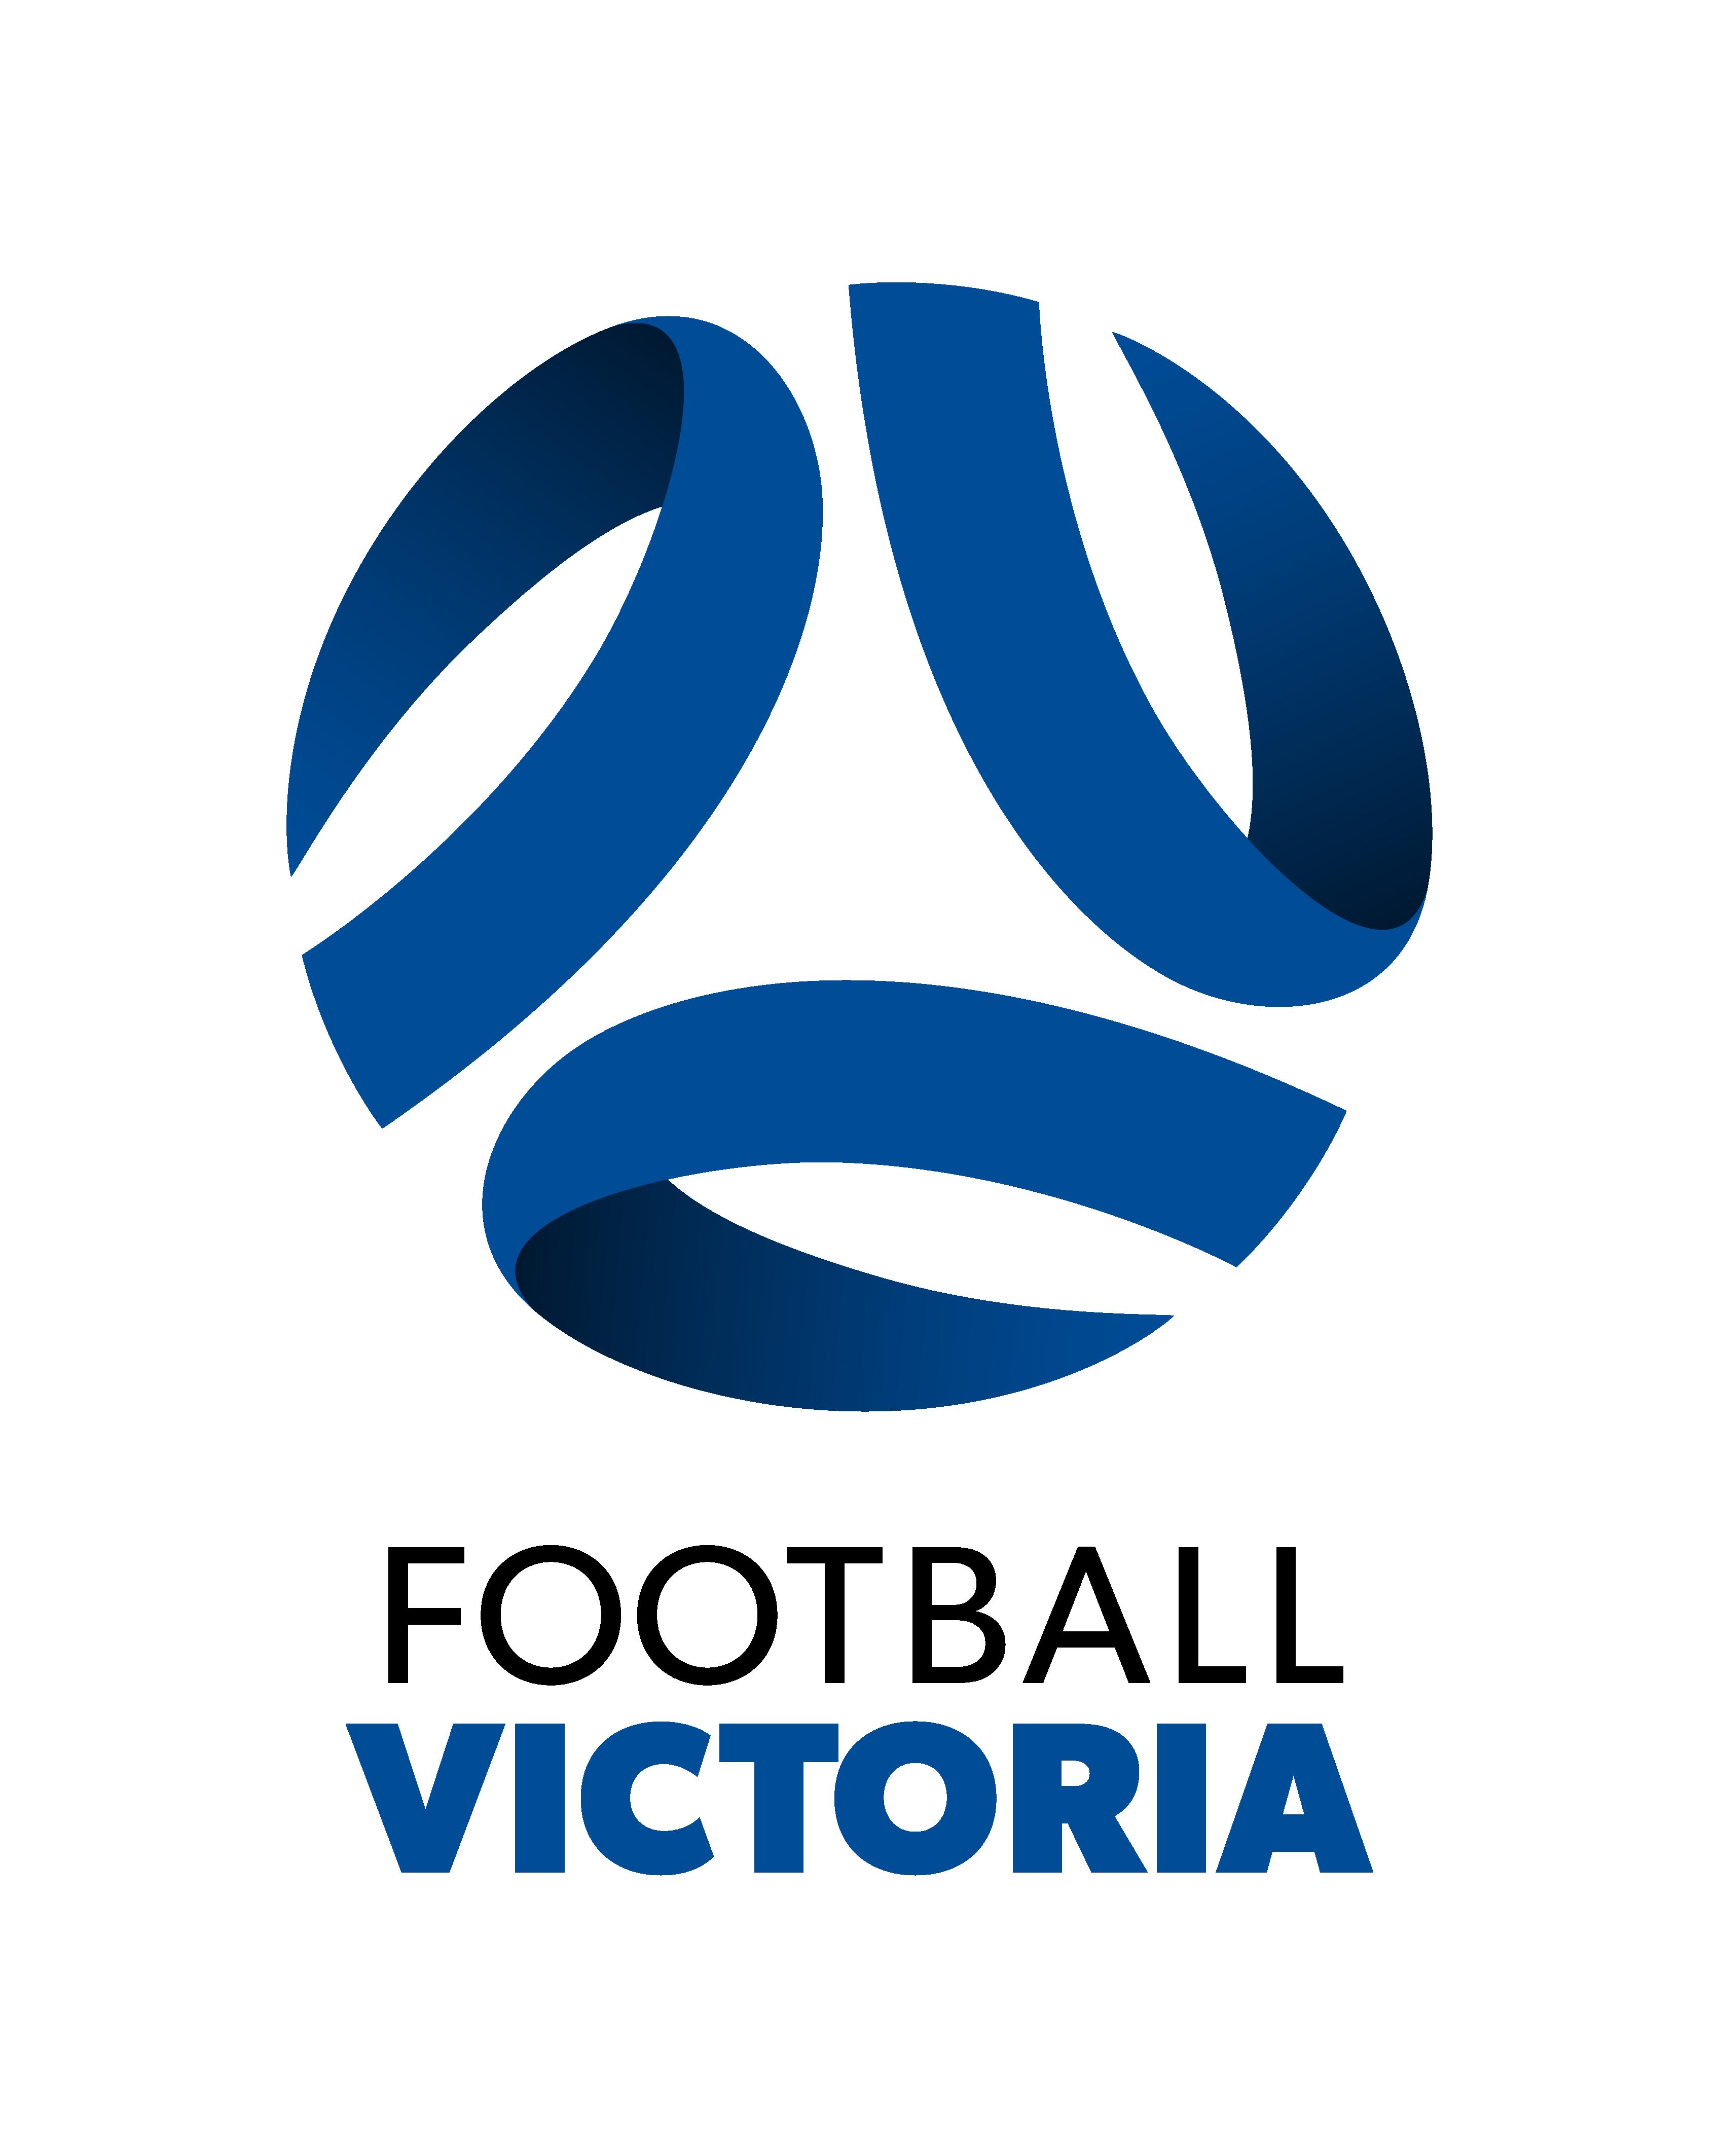 Football Victoria